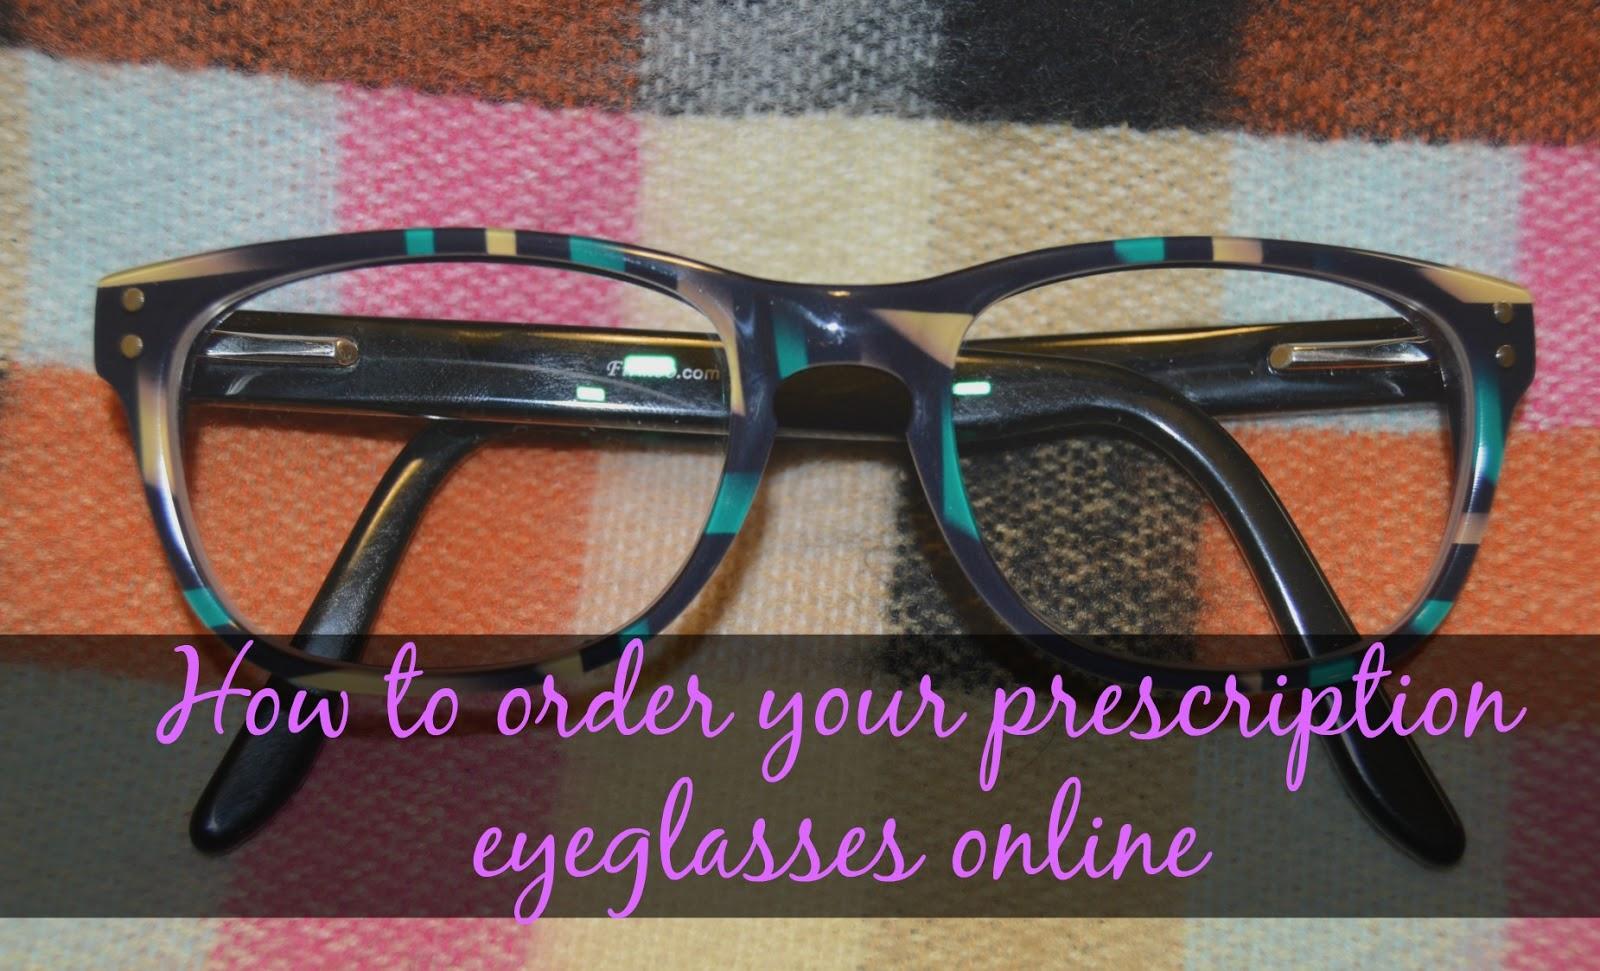 Online, Eyeglasses